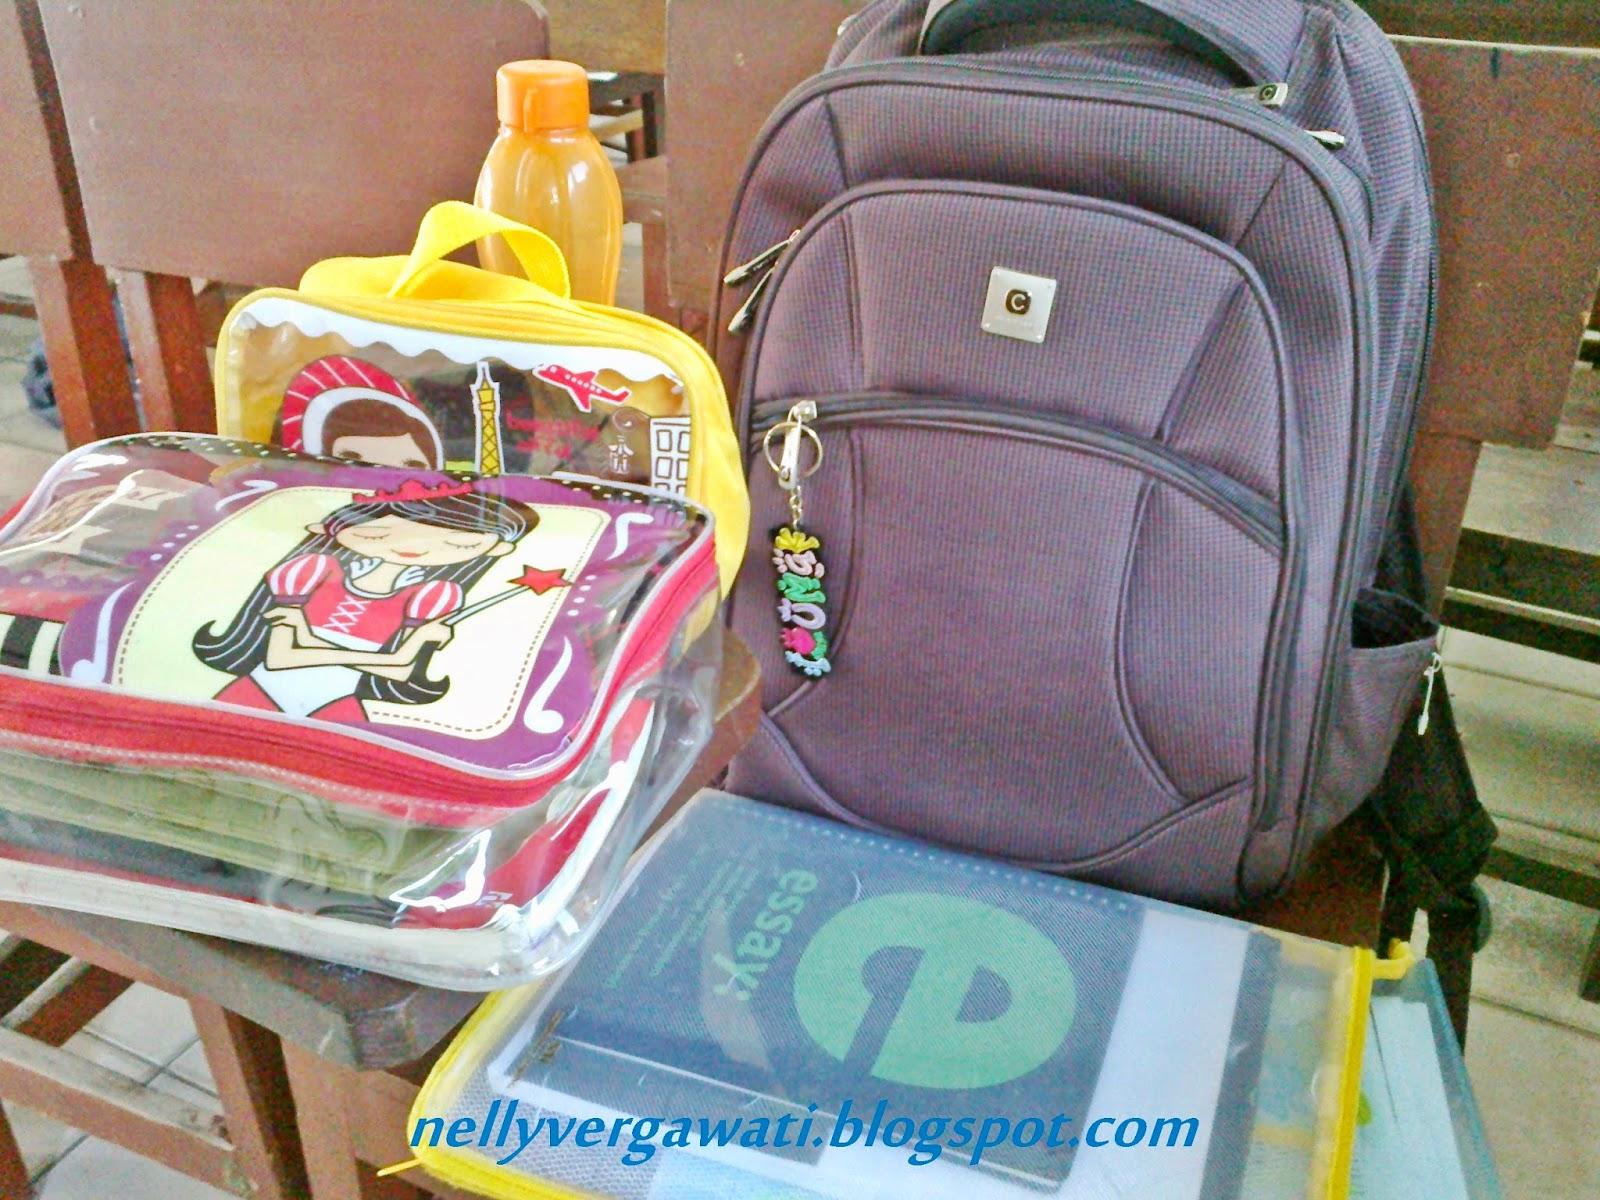 "Tadaaaaa begitulah profil picture about beloved backpack ransel kesayangan ini juga berhiaskan mainan gantung yang bertuliskan ""ILOVEUMAK"" saya sangat"